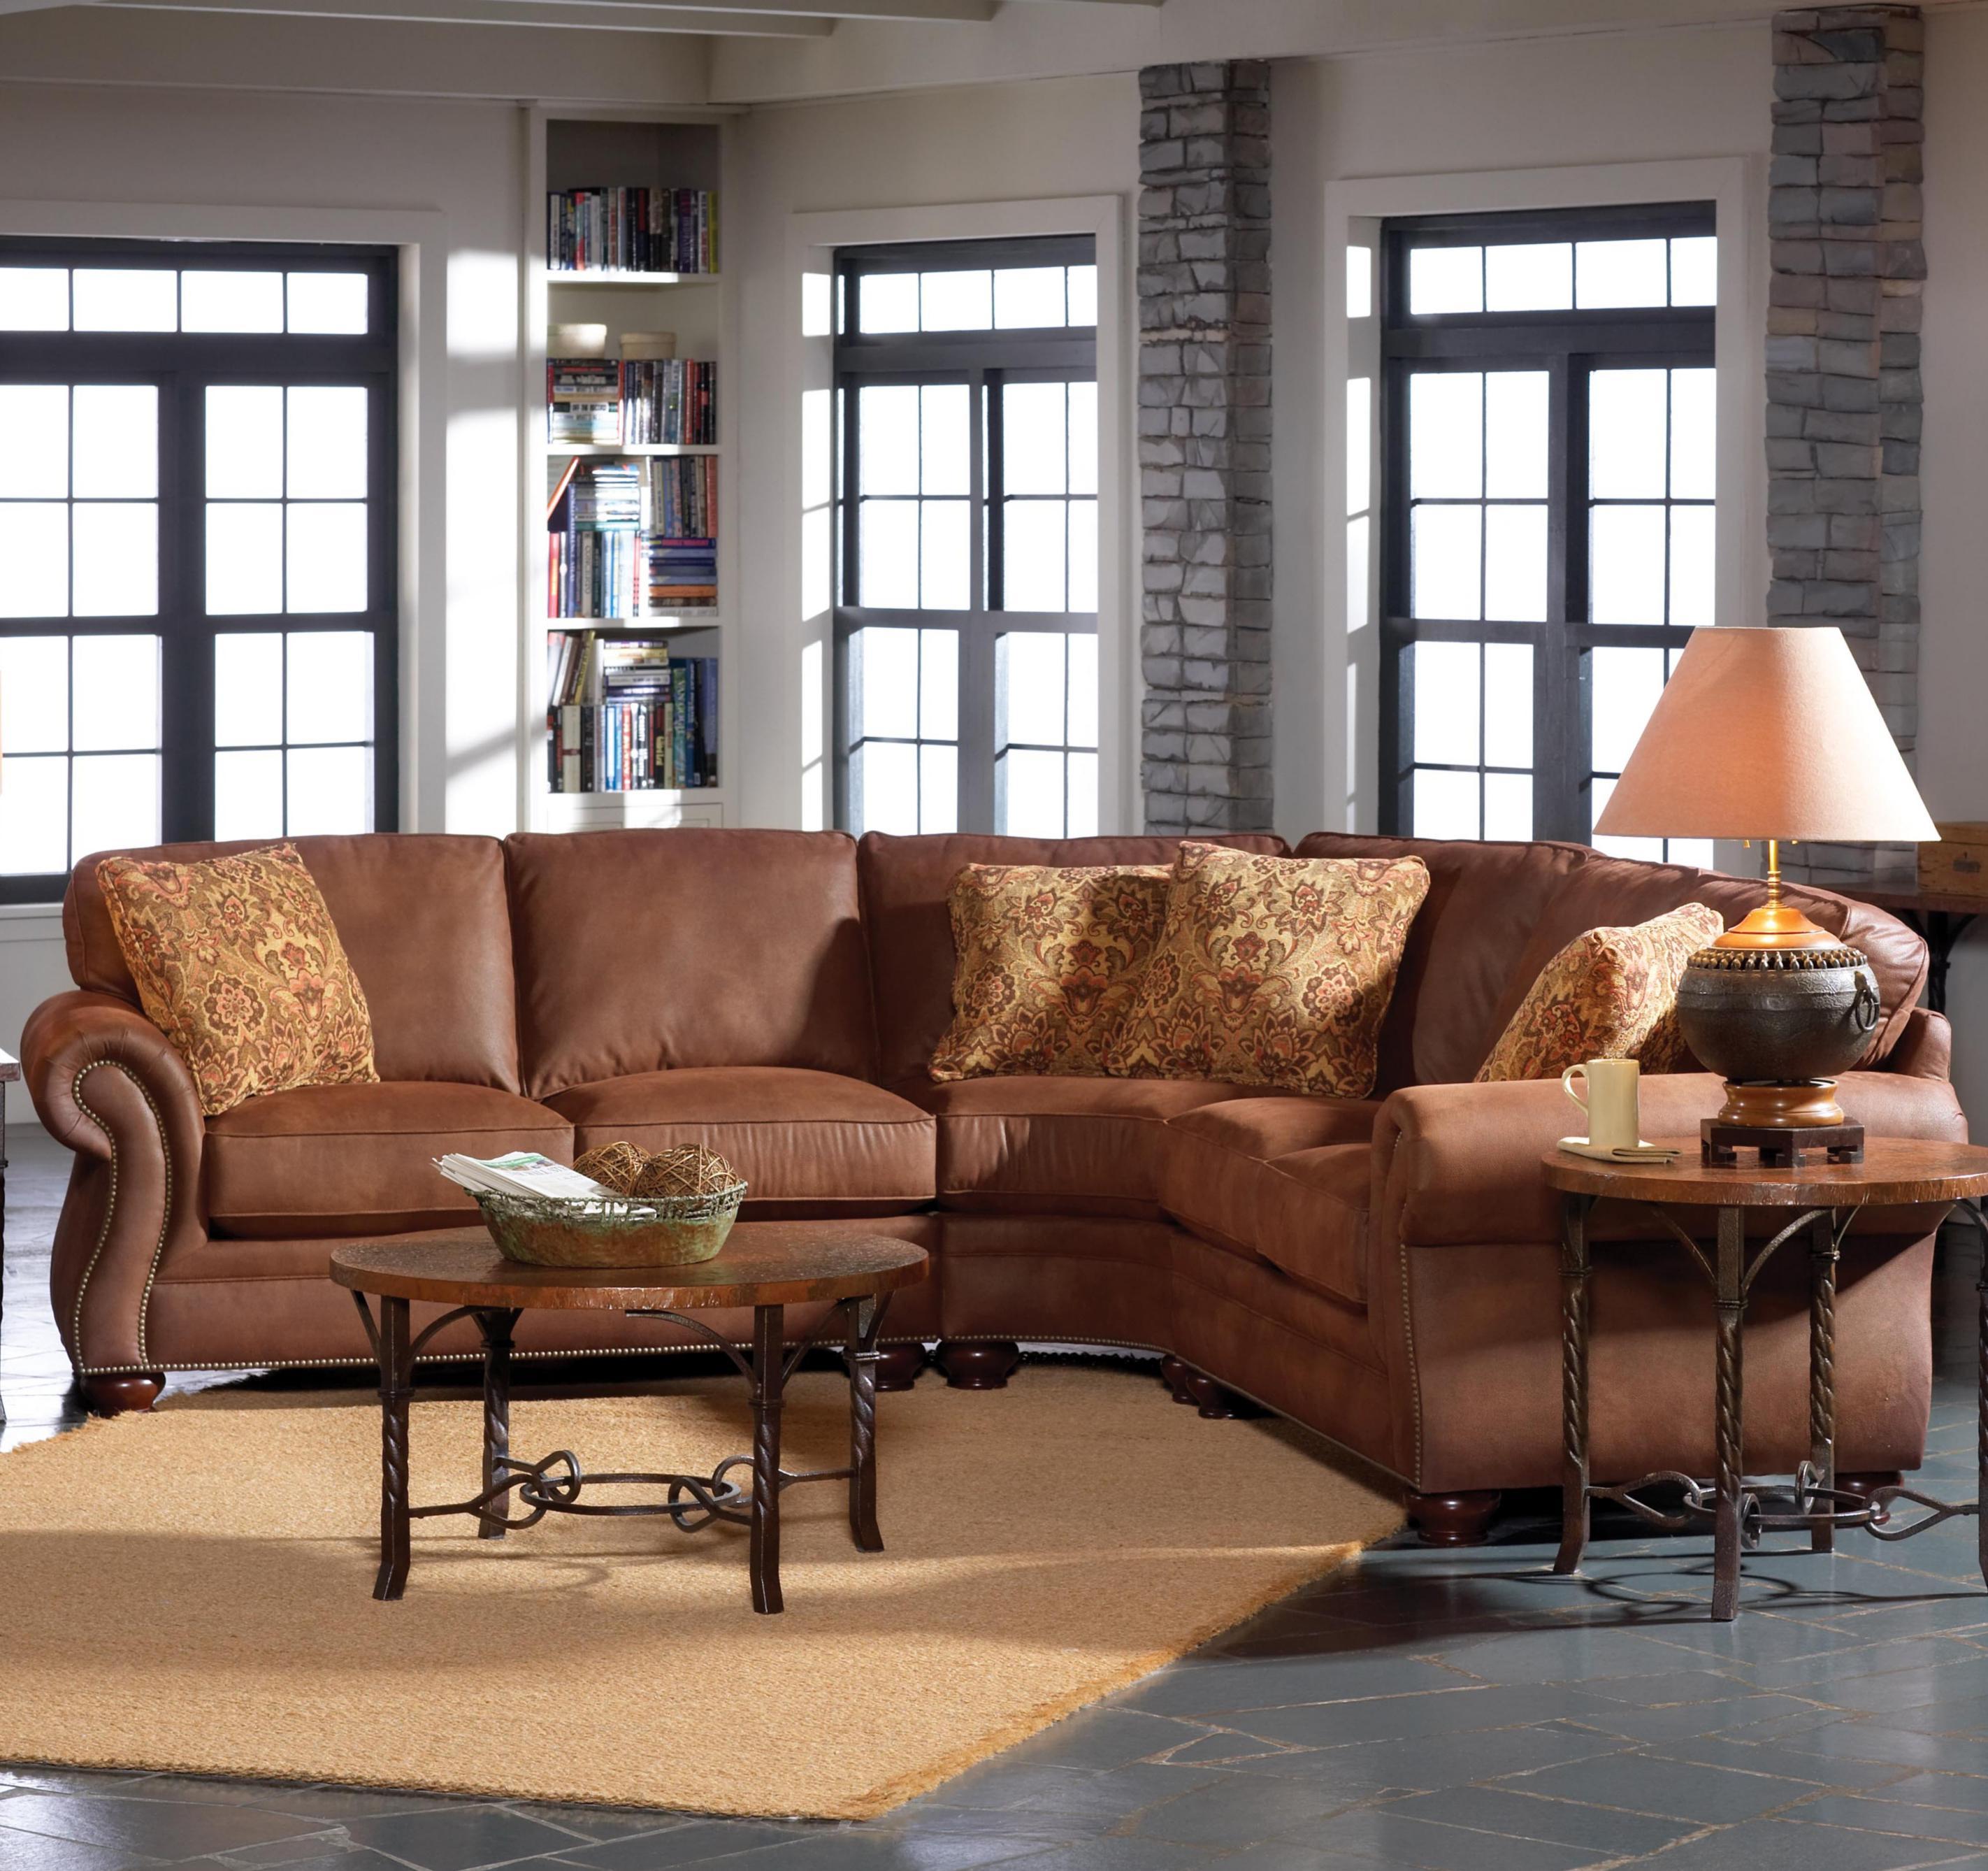 Broyhill Furniture Laramie 2 Piece Corner Sectional Sofa | Wayside  Furniture | Sectional Sofas